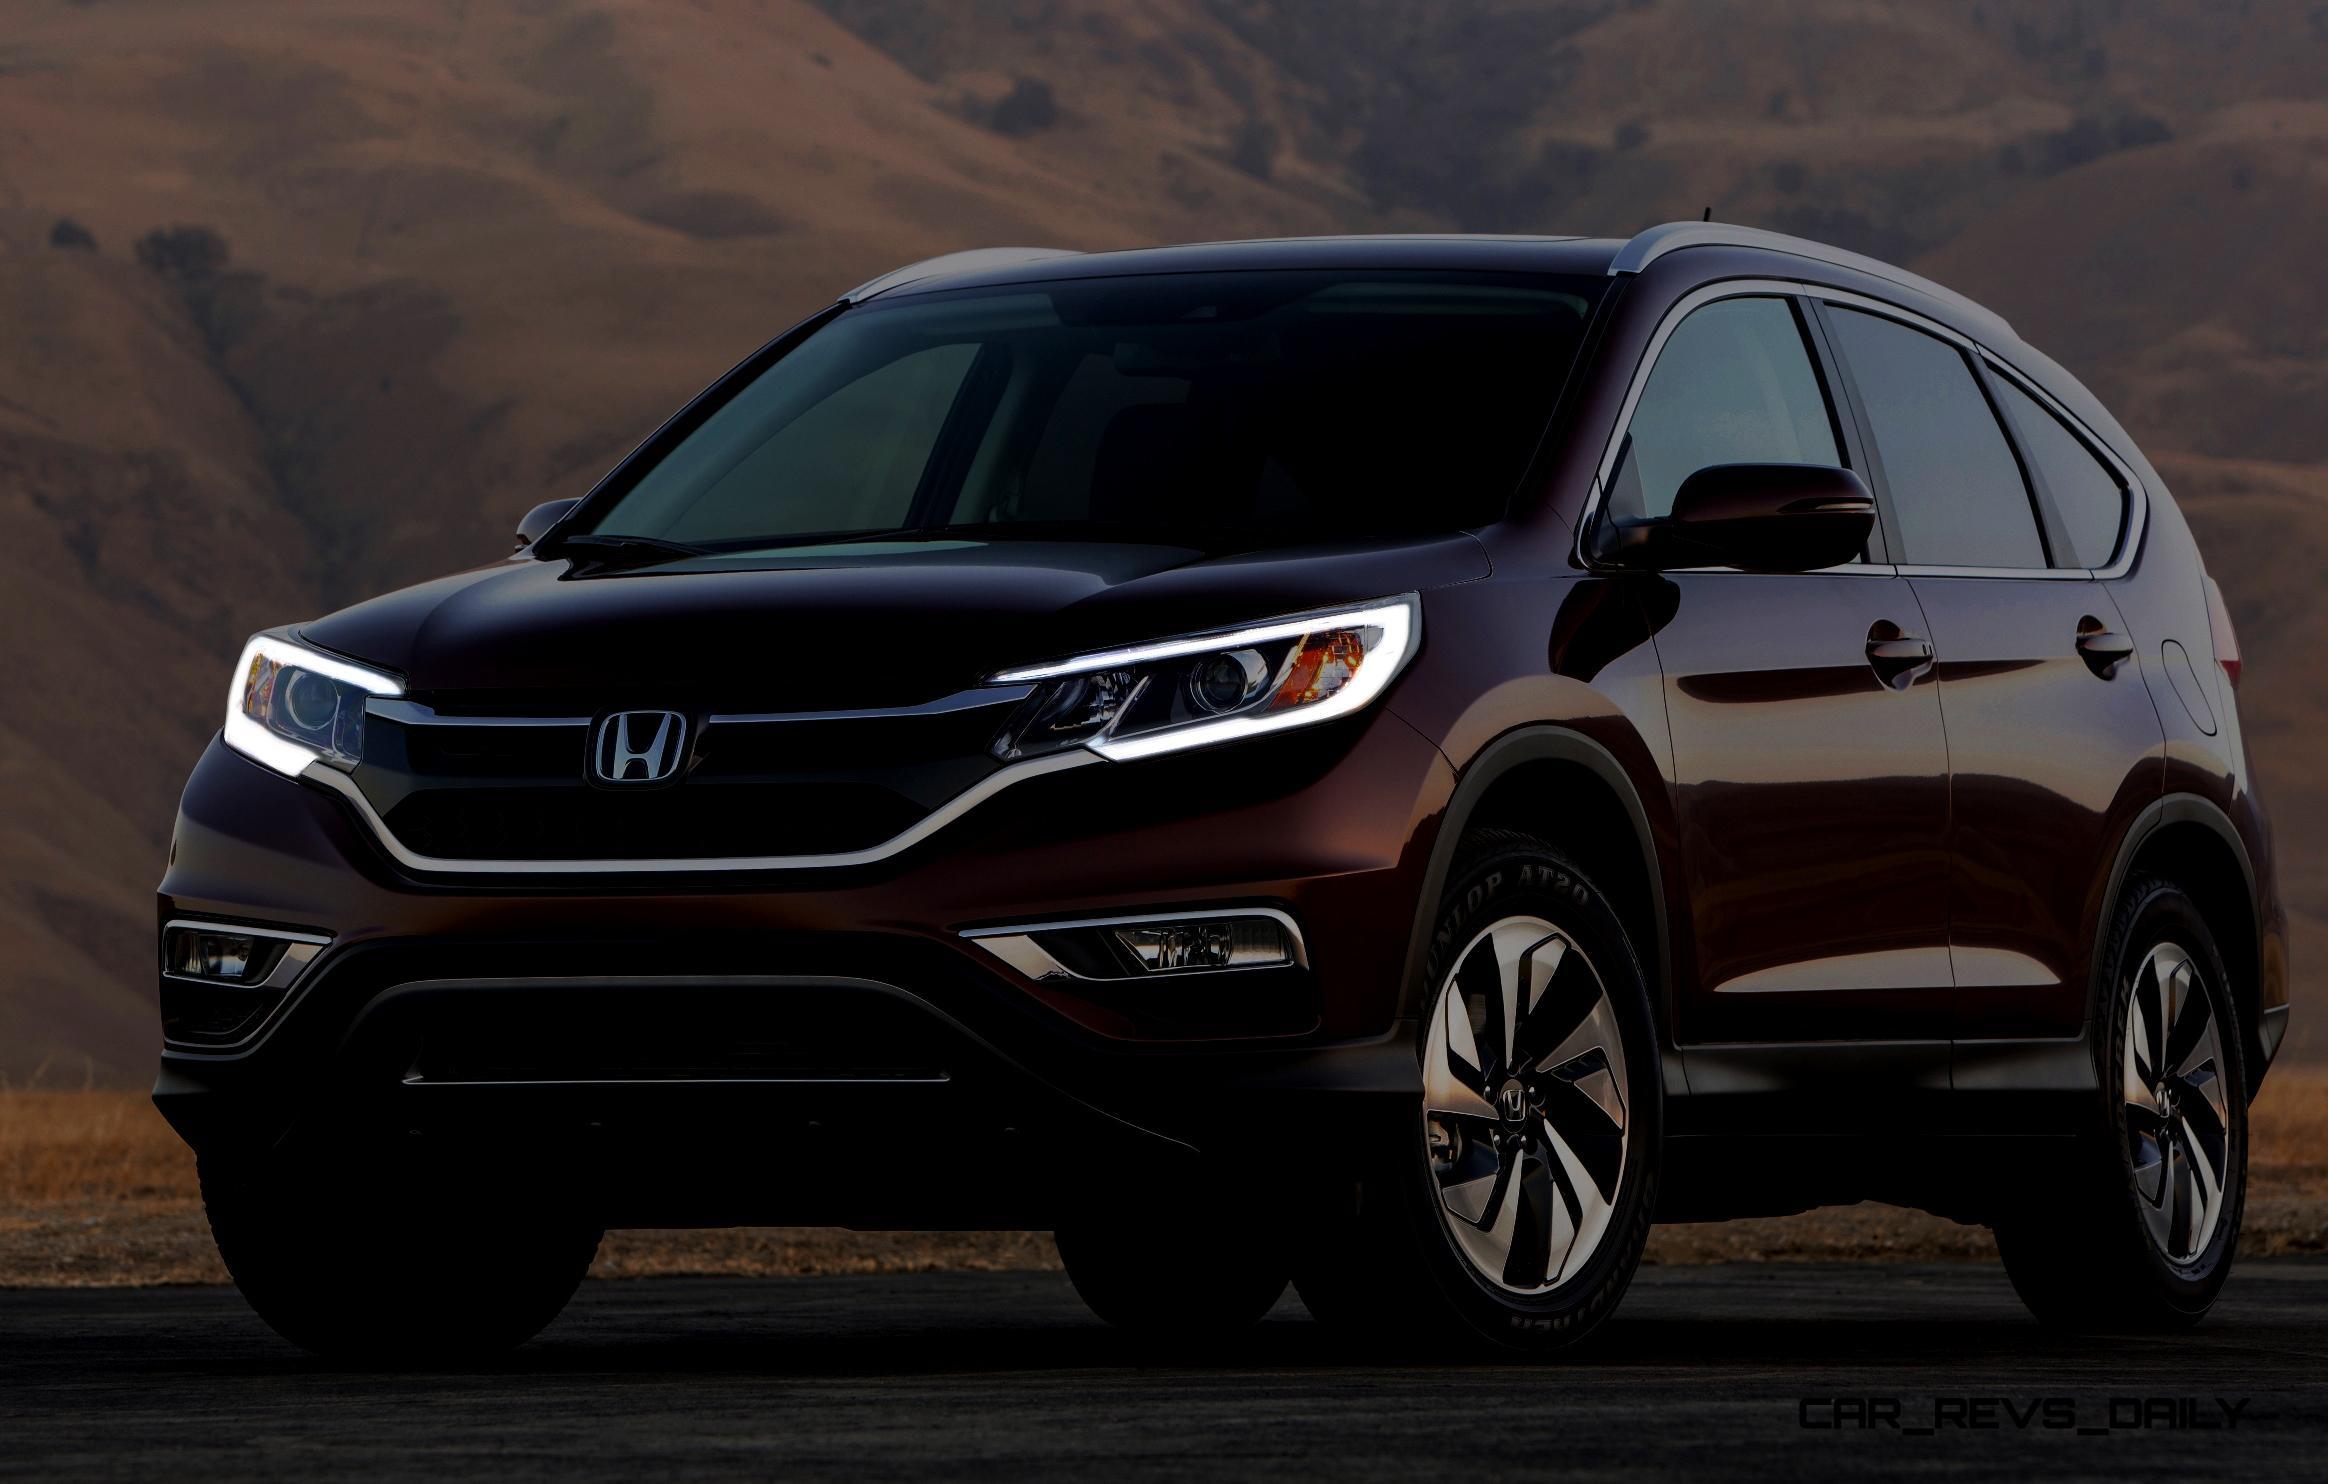 2015 Honda CR-V Refreshed Inside and Out - On Sale October 1st